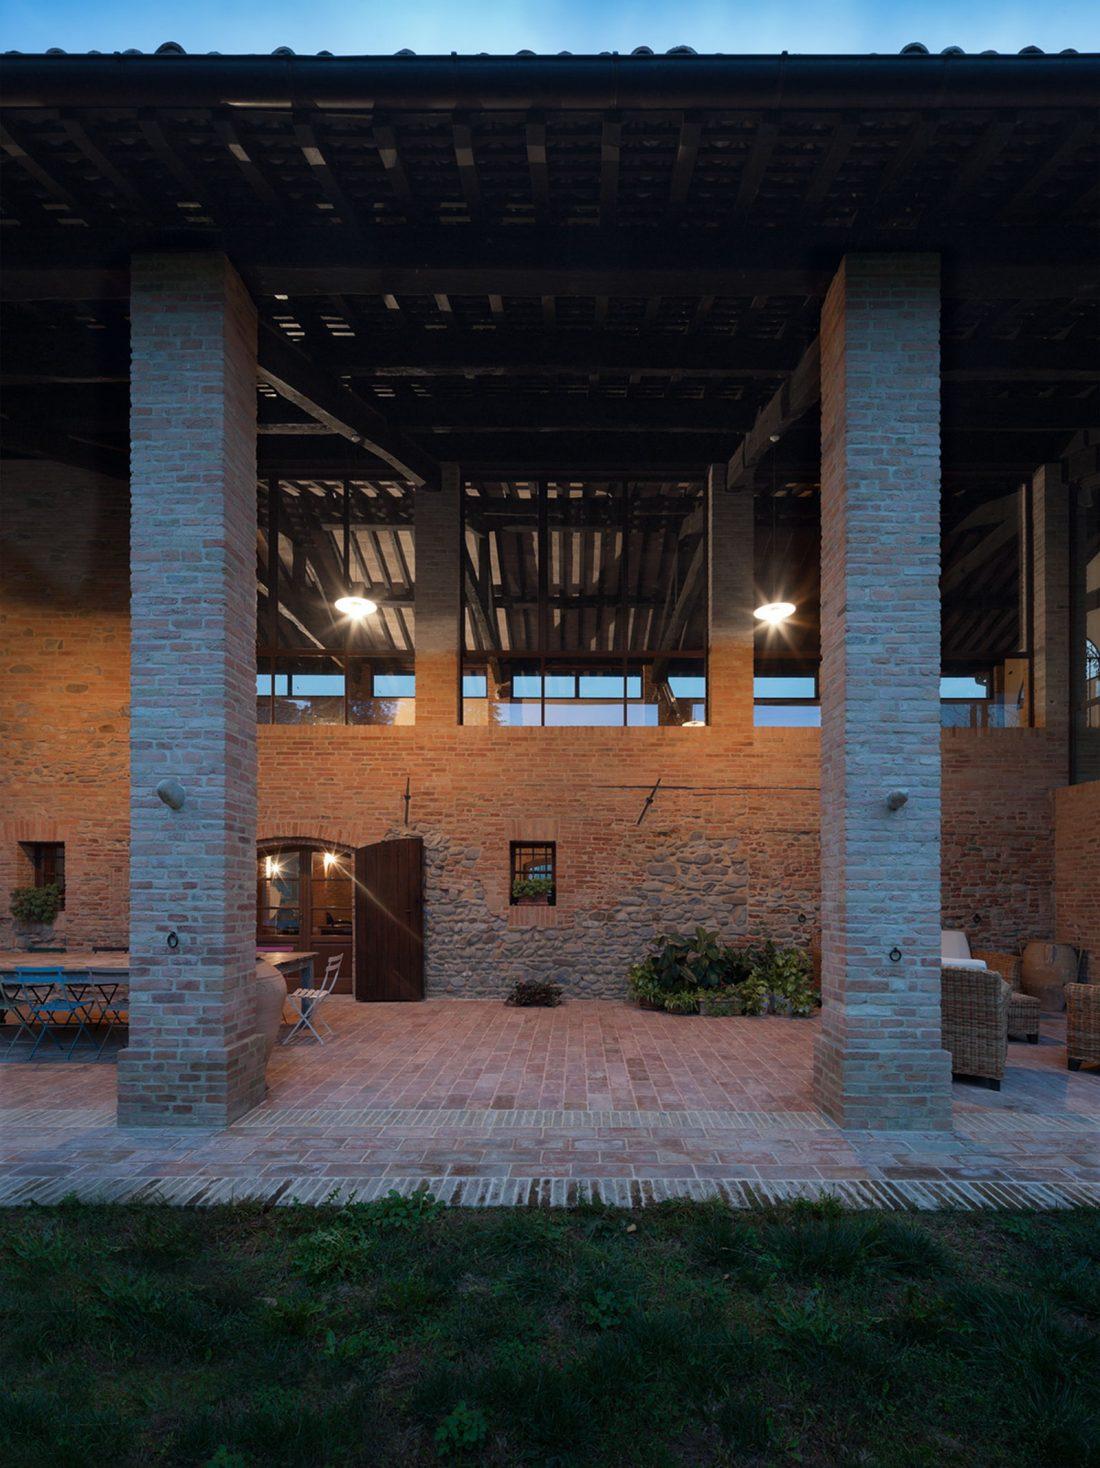 obnovlenie-starinnoj-fermy-ot-studii-studiomas-architetti-11